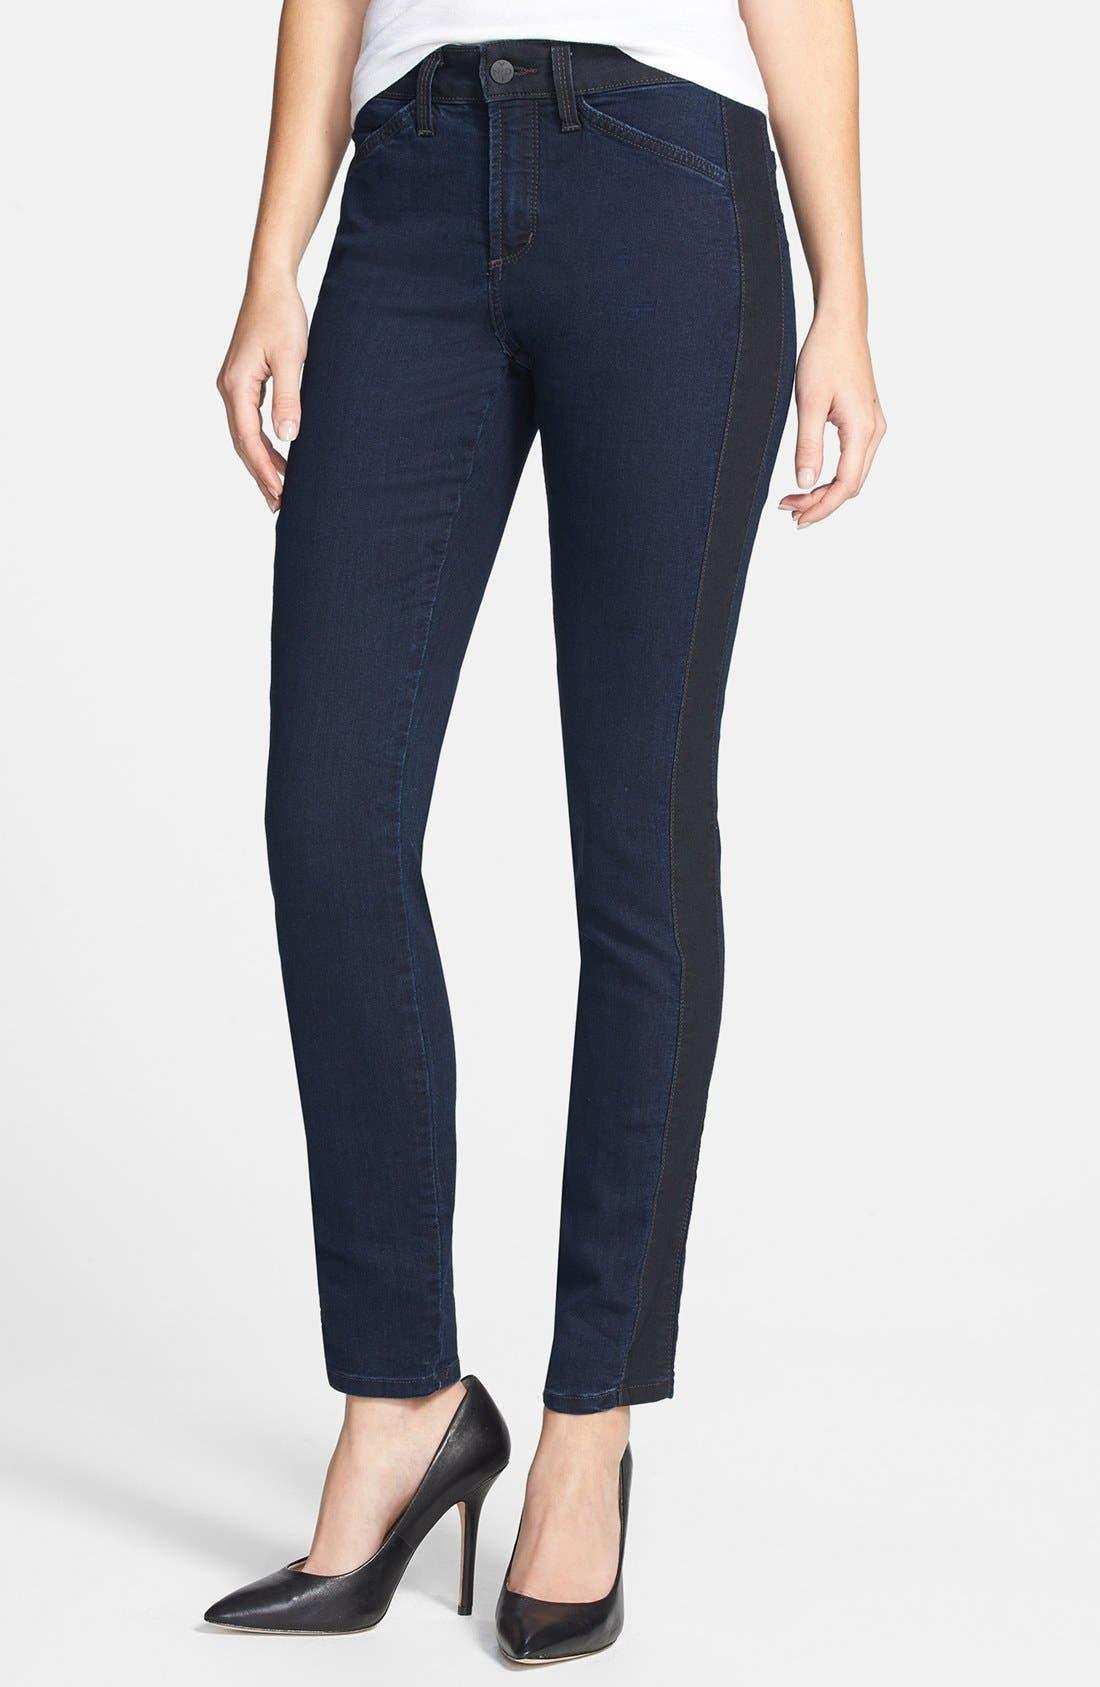 Alternate Image 1 Selected - NYDJ 'Alexandra' Tuxedo Stripe Stretch Skinny Jeans (Covina)